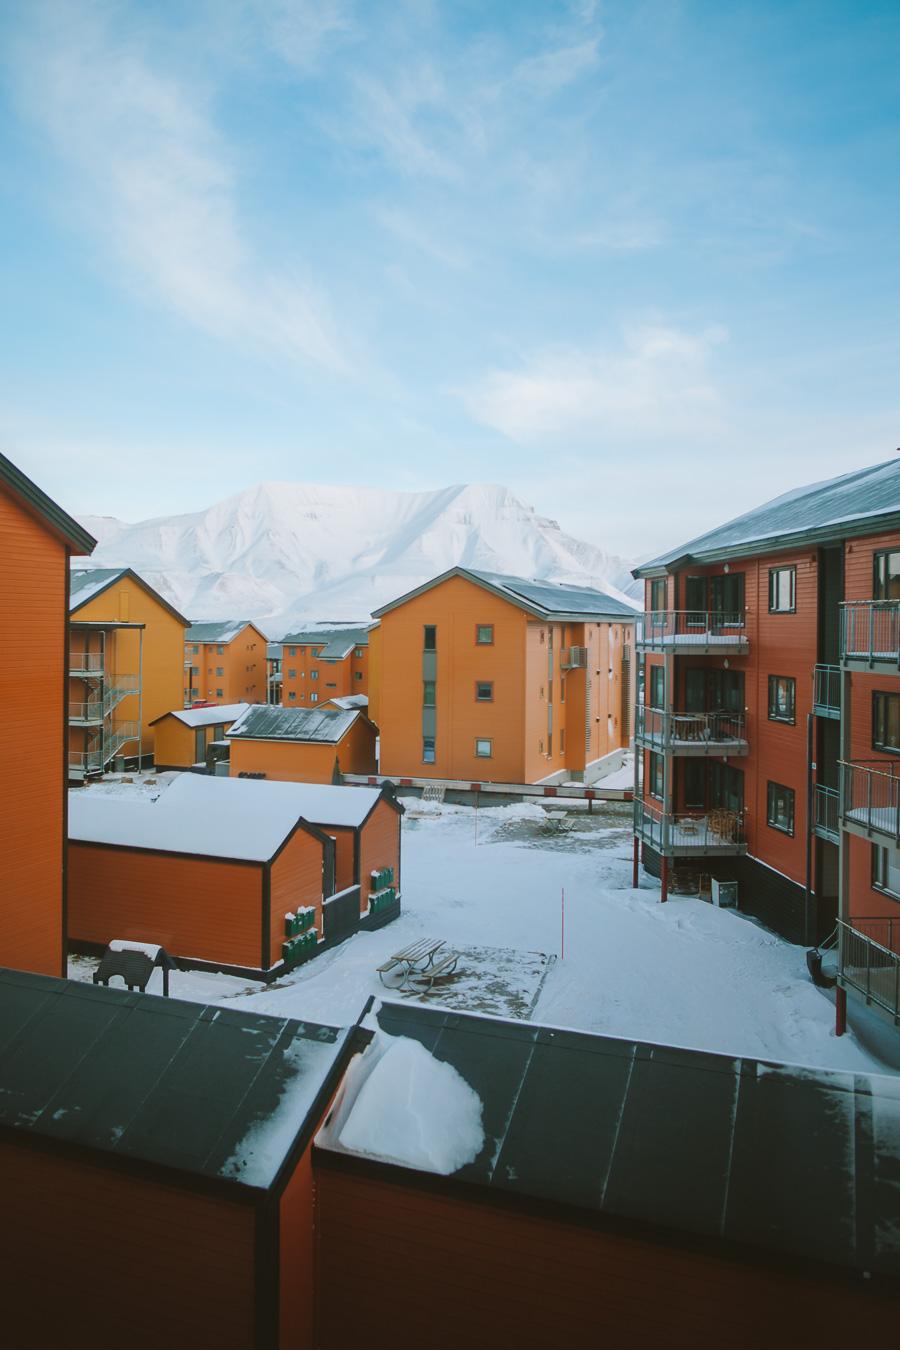 Colourful houses in Longyearbyen